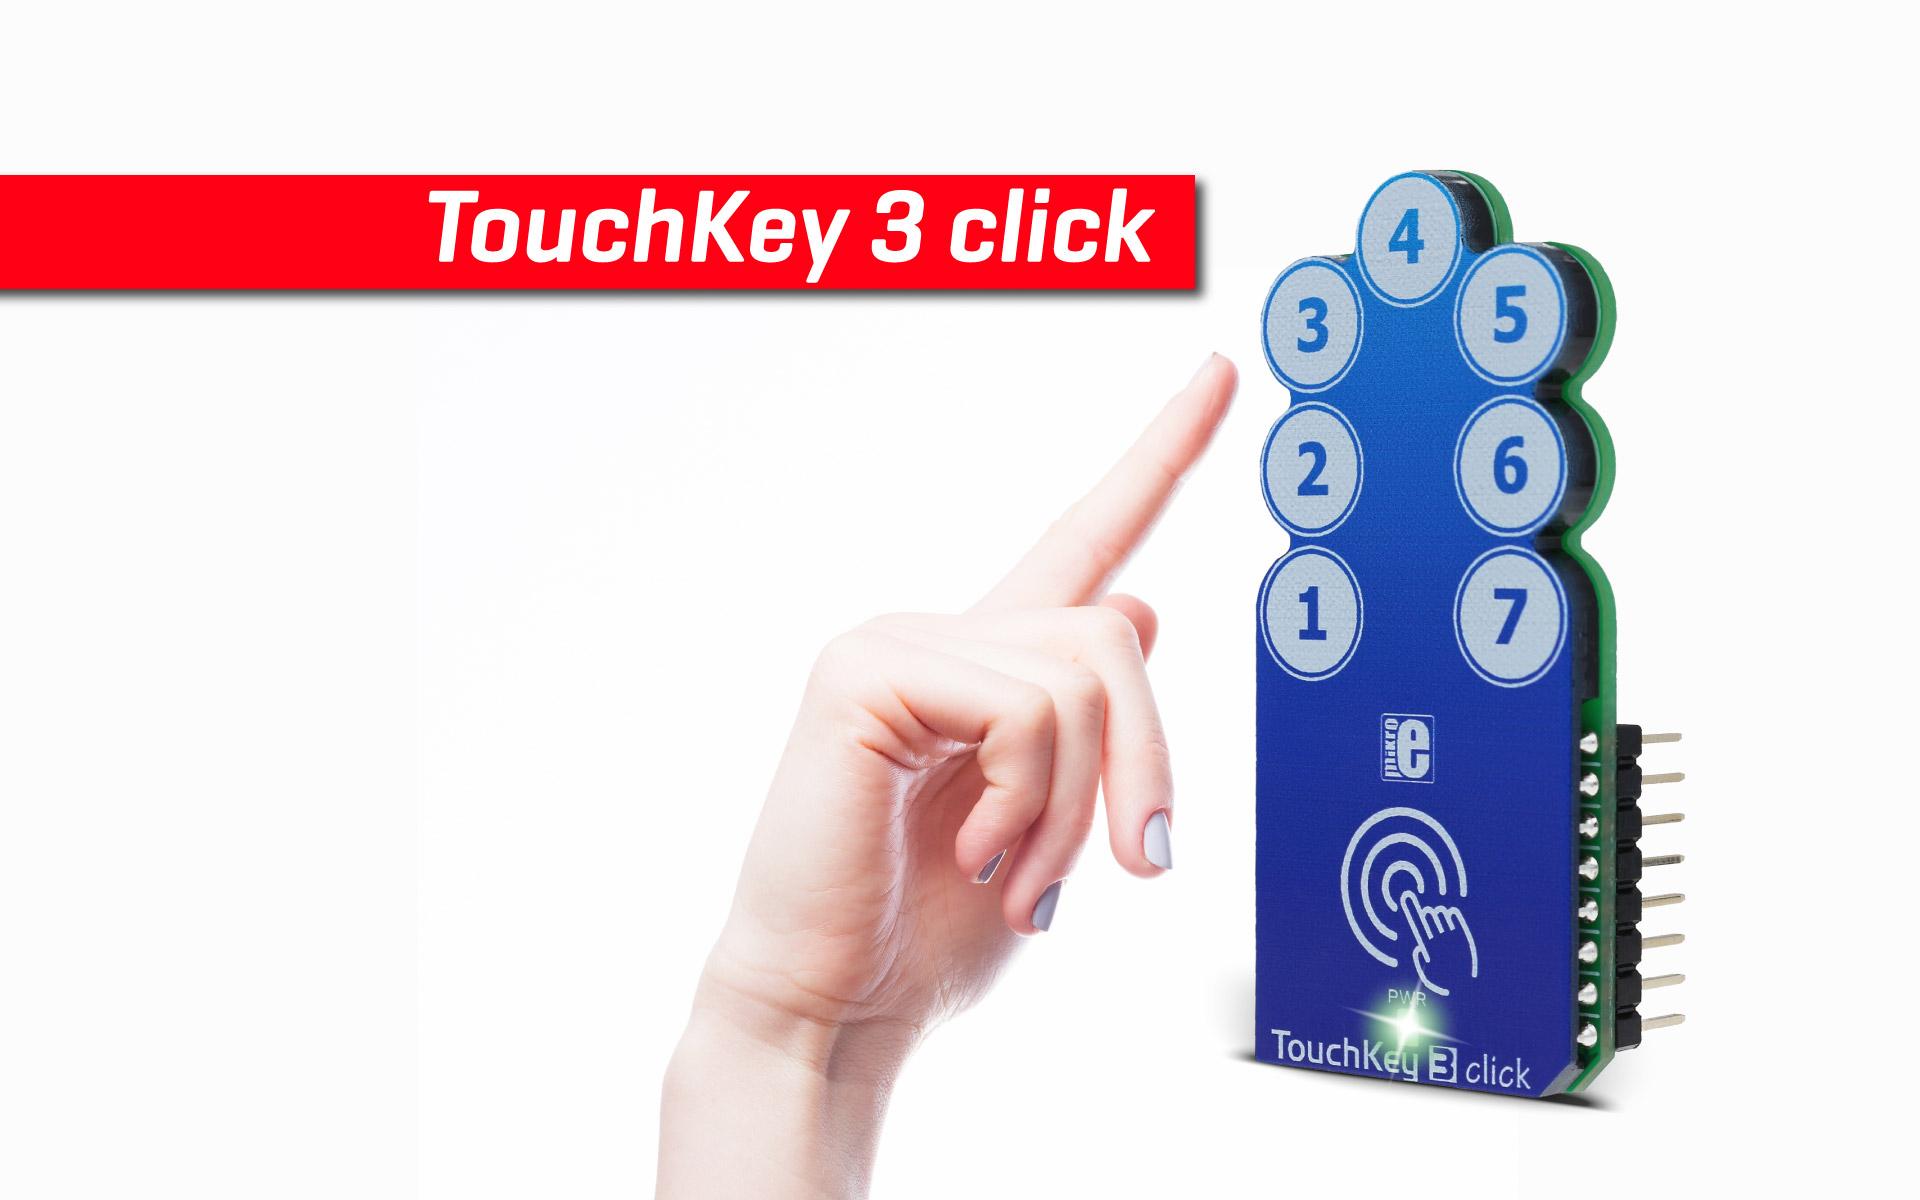 TouchKey 3 click - advanced capacitive sensors